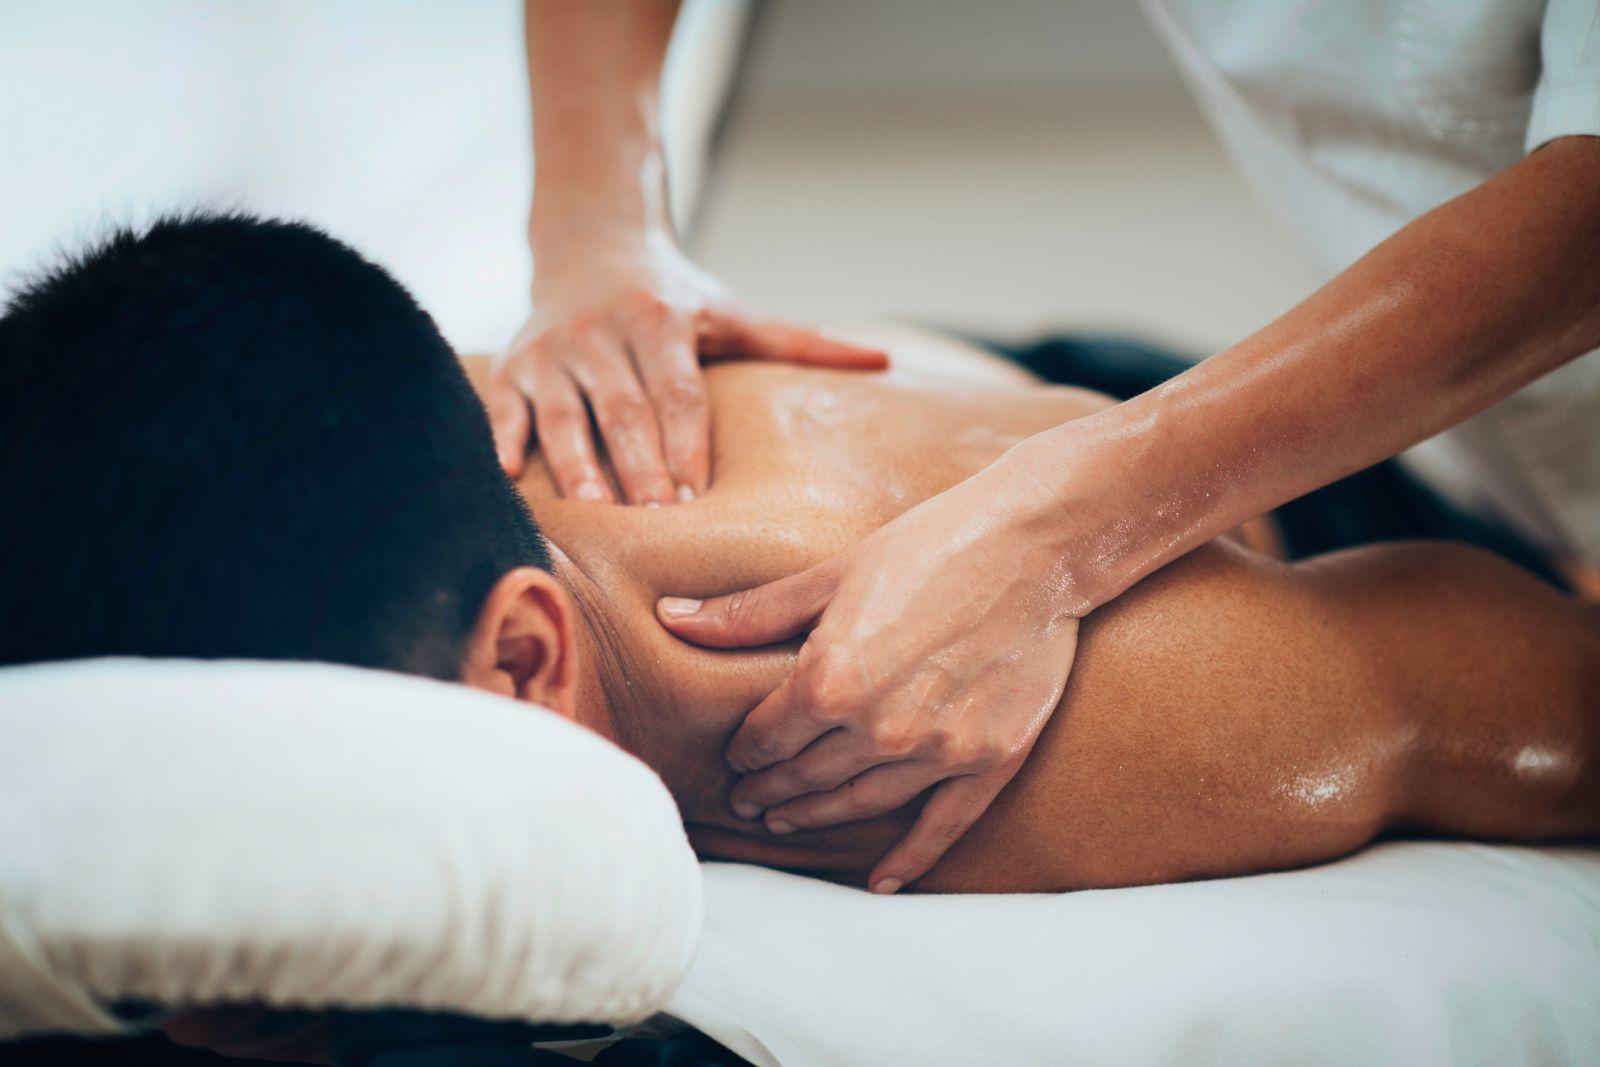 unlicensed massage therapists